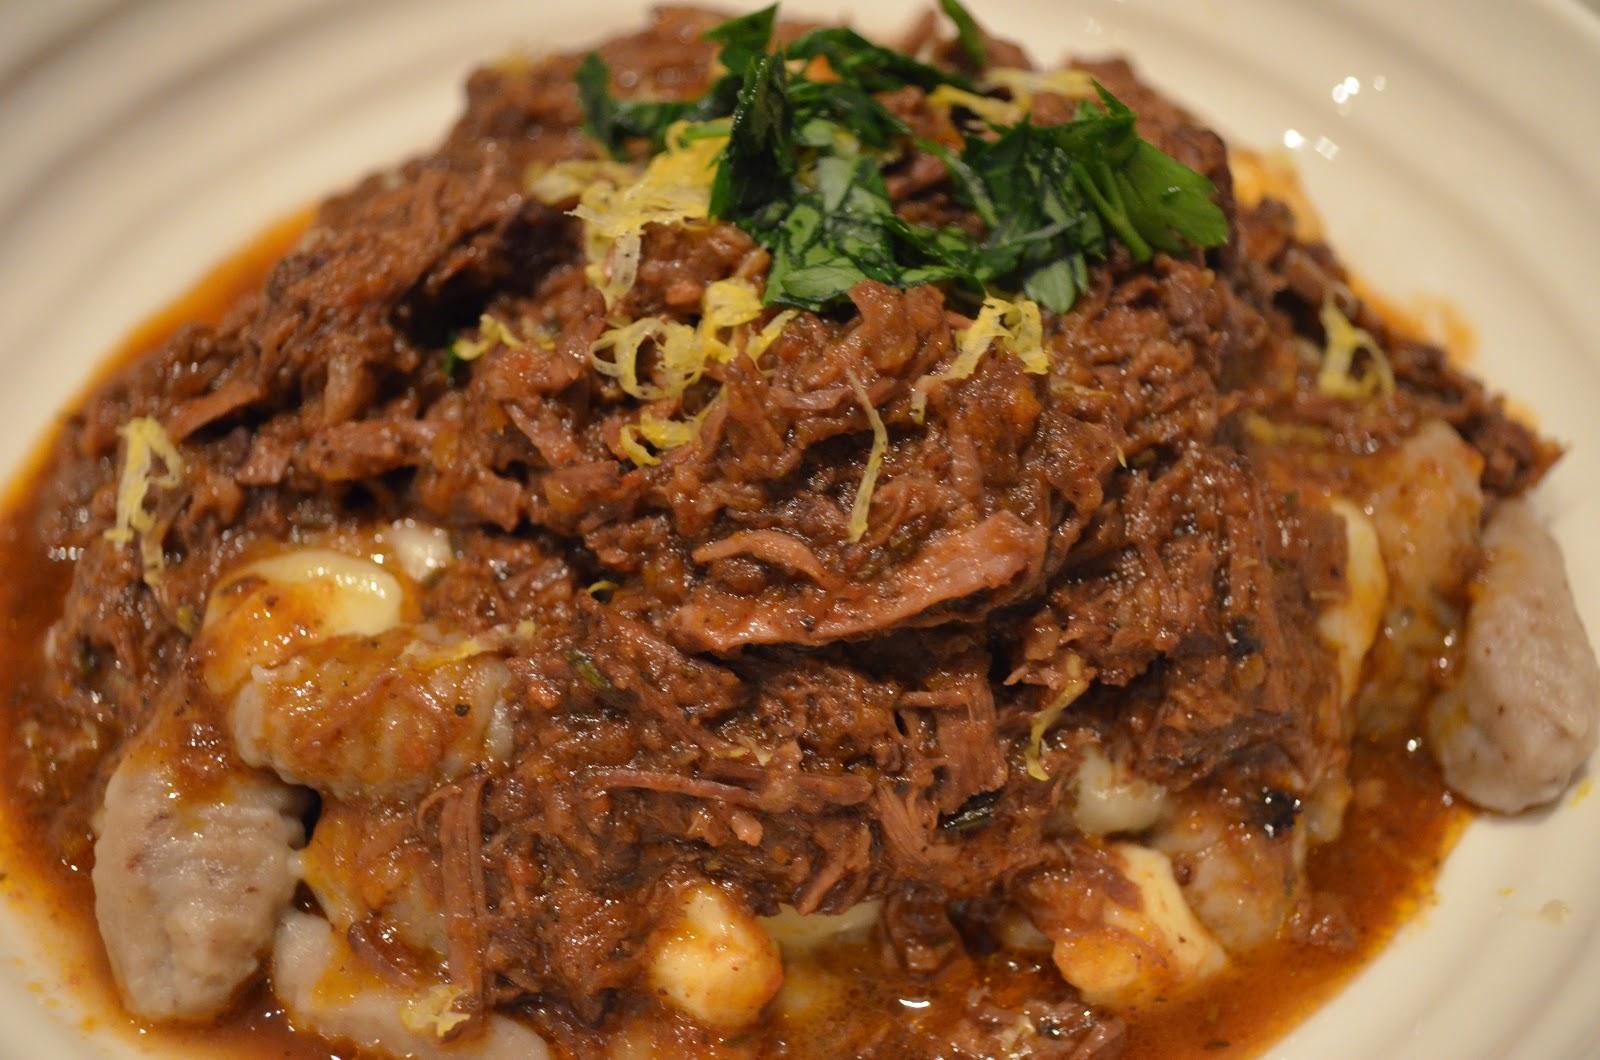 Foodie Funday Sunday: Gnocchi Poutine with Braised Short Rib Ragu